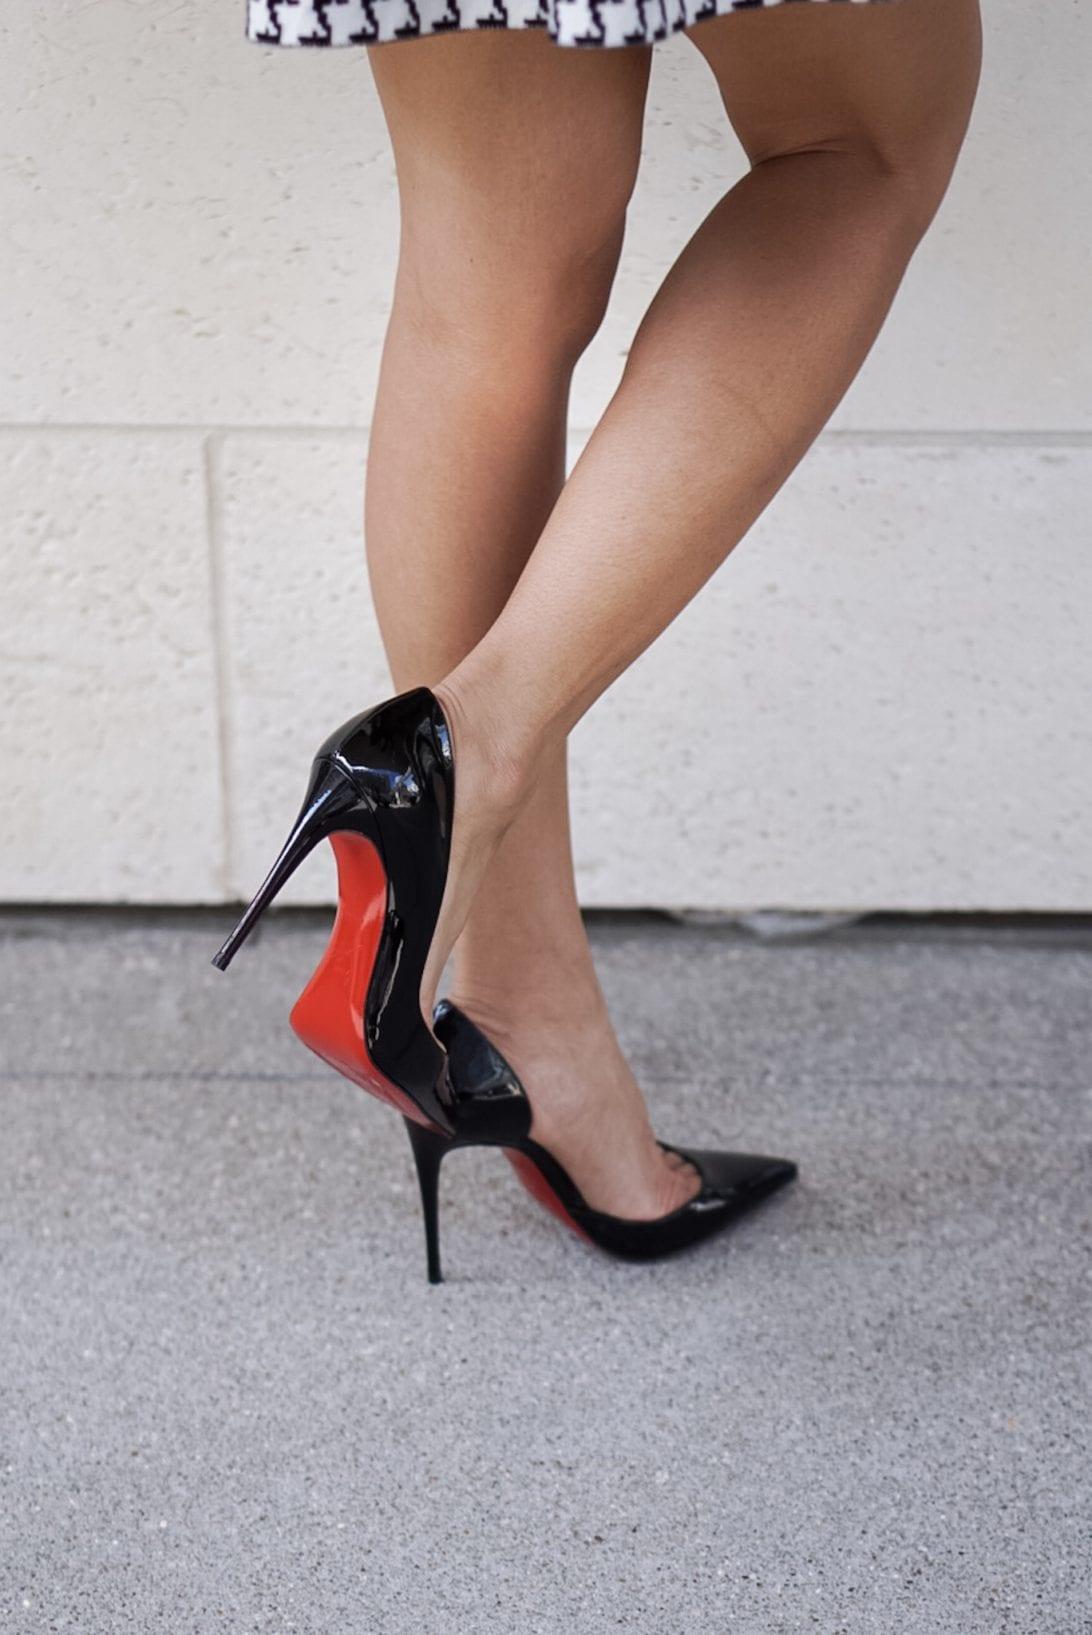 christian louboutin, heels, red soles, black pumps, black patent heels